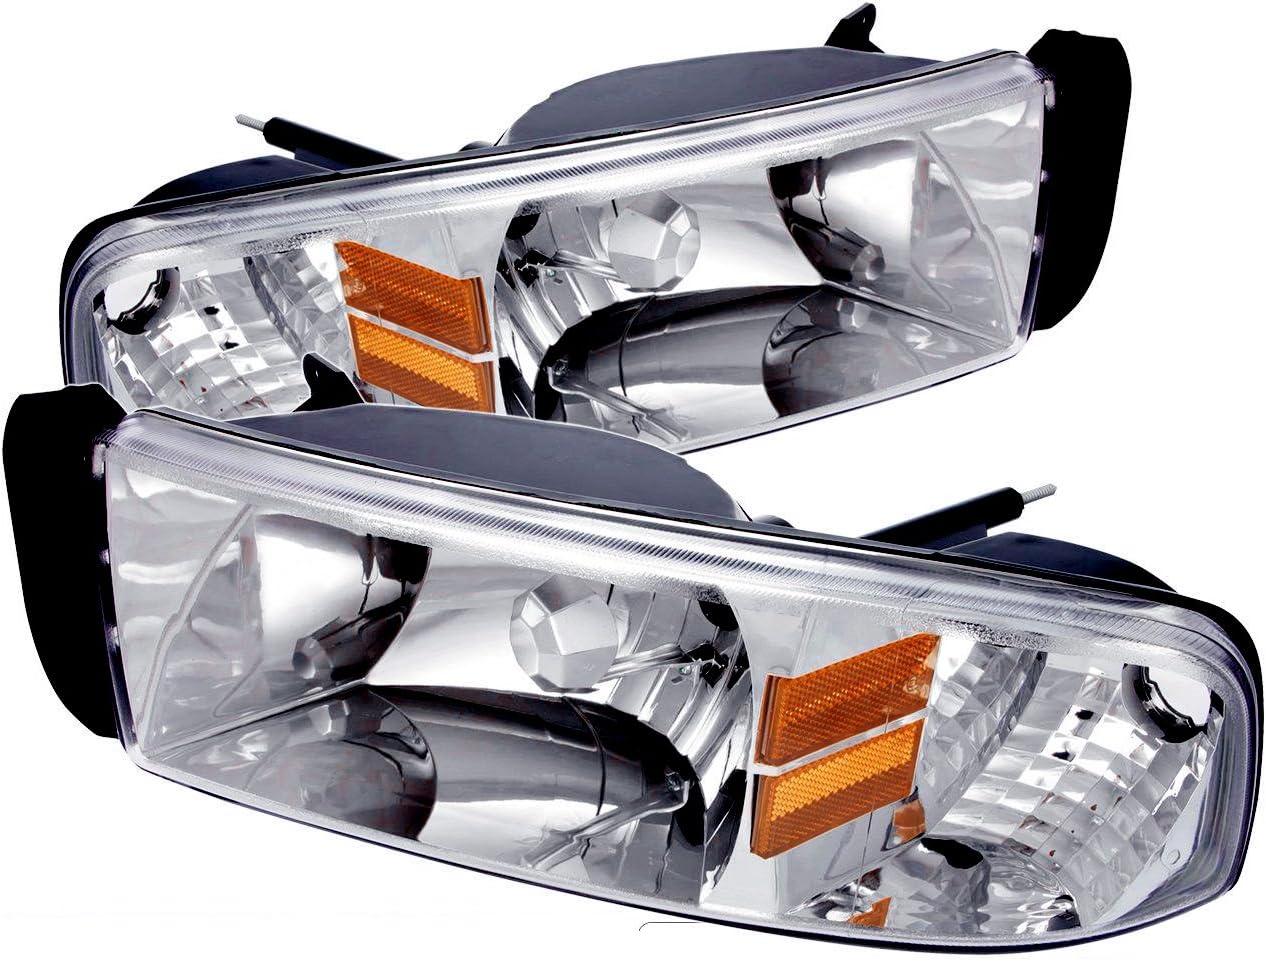 For 1994-2001 Dodge Ram 1500 Headlight Bulb Hella 71318SM 1995 1996 1997 1998